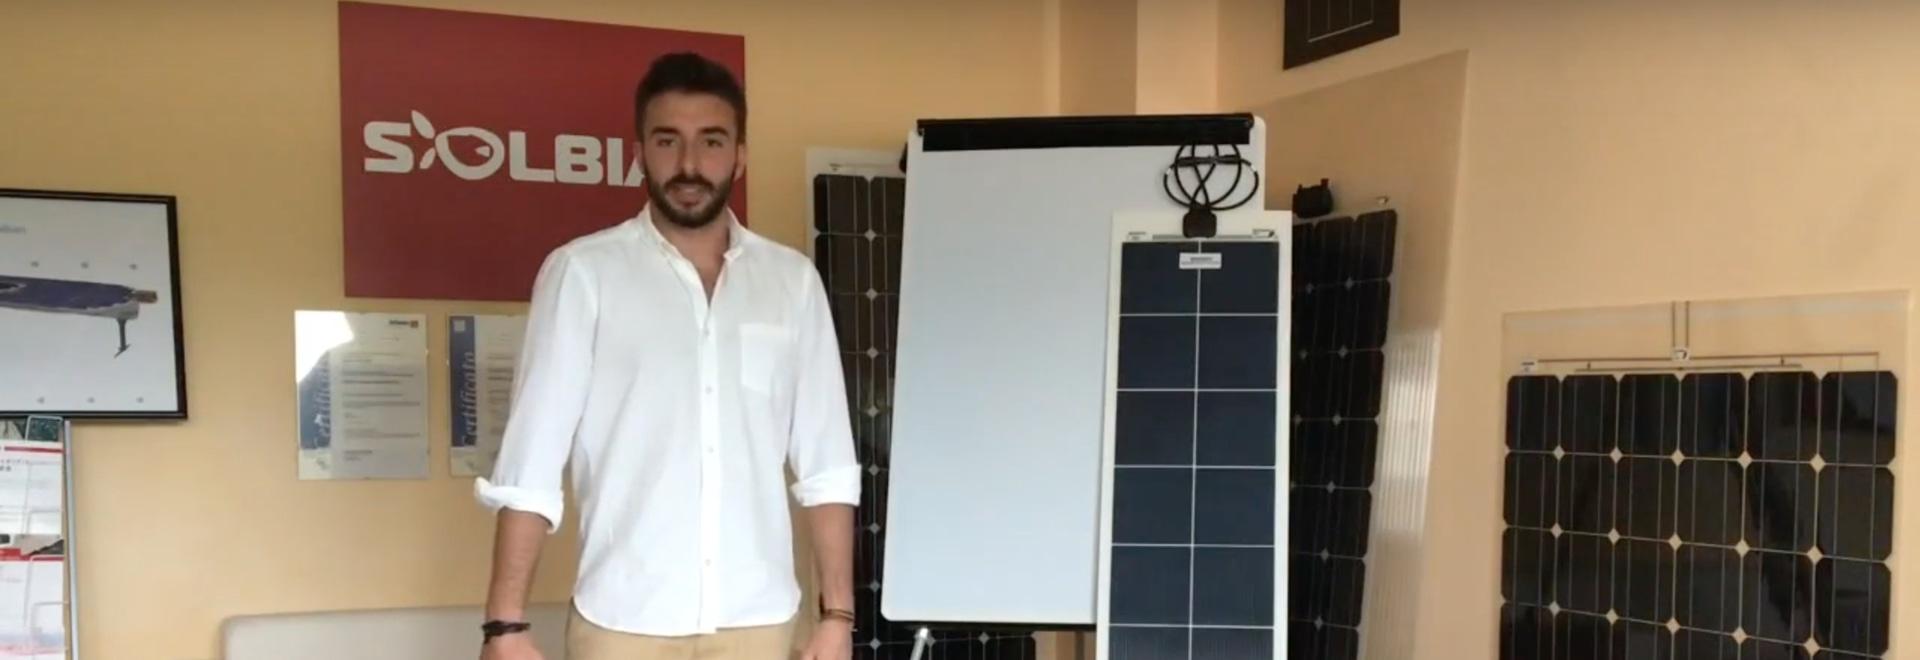 Solbian SXp Series: the video